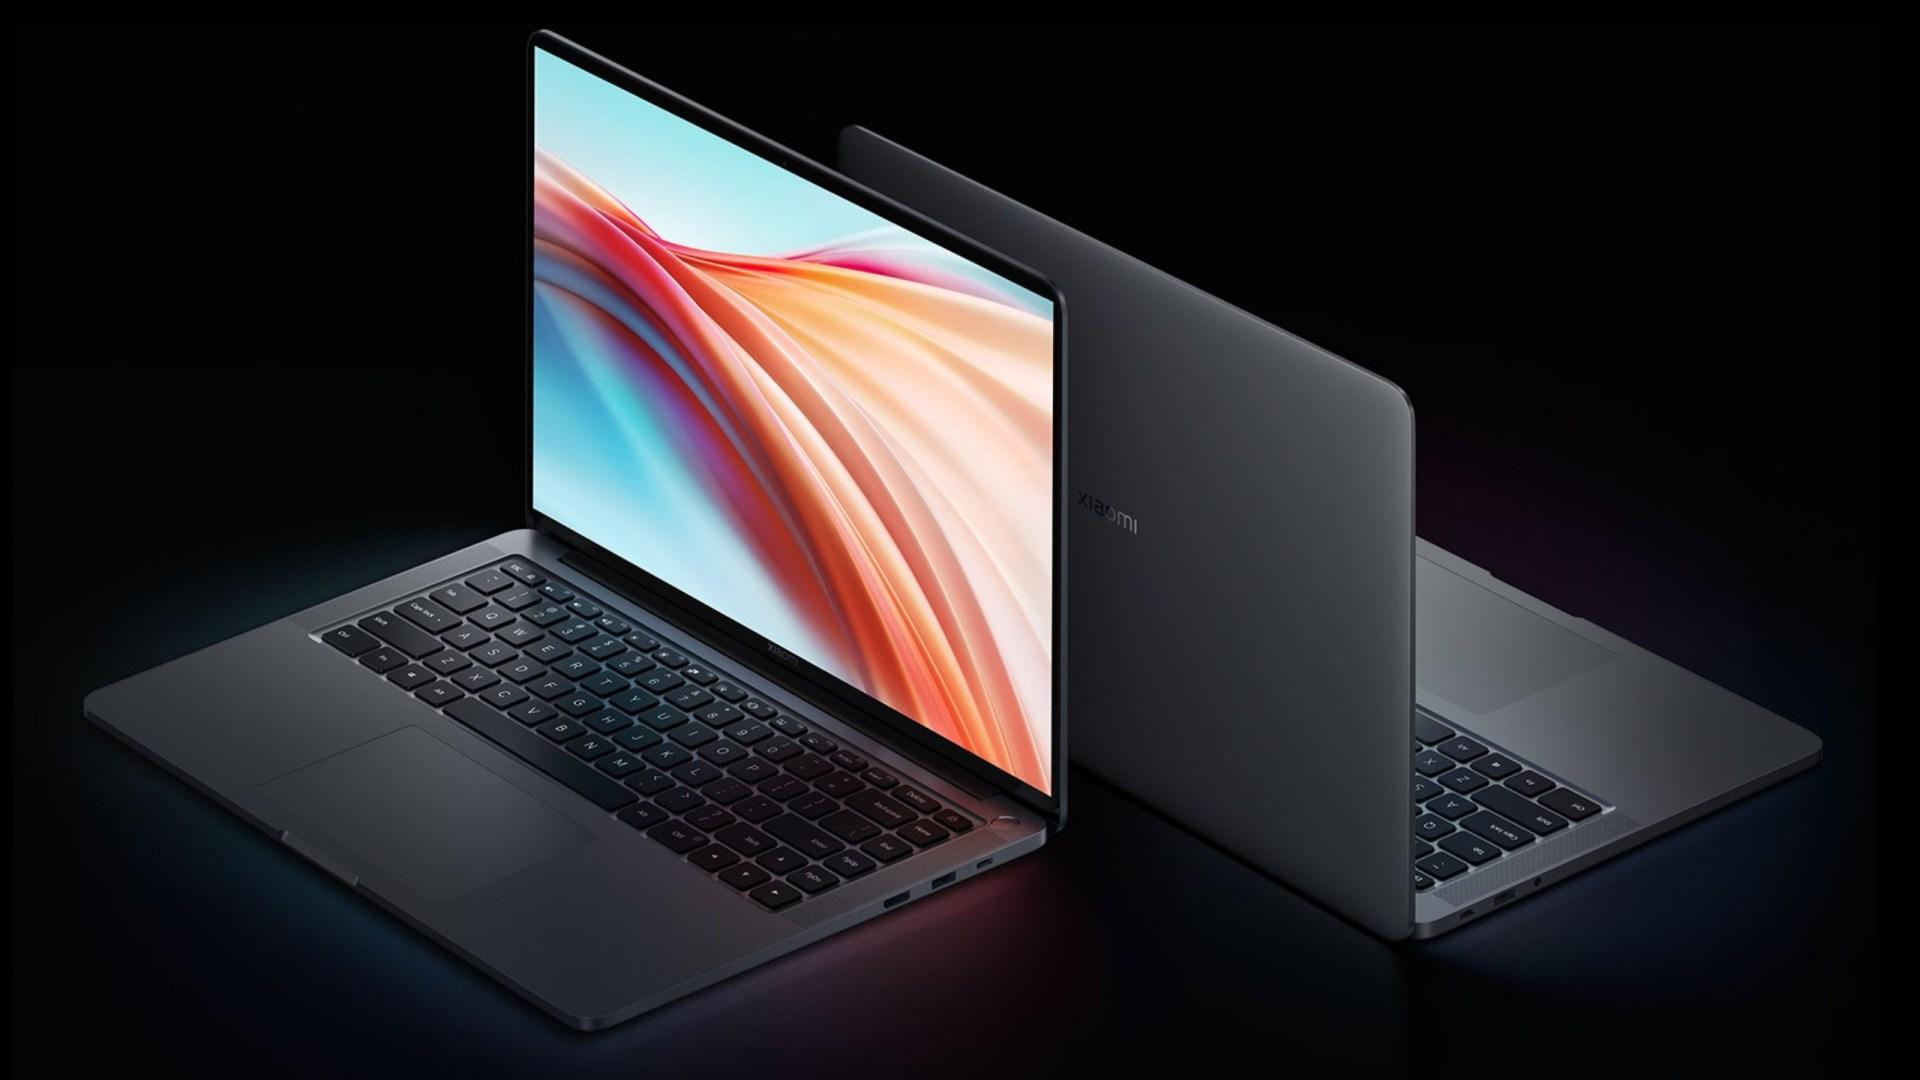 Notebook, Intel, Laptop, Xiaomi, Xiaomi Mi Notebook Pro X